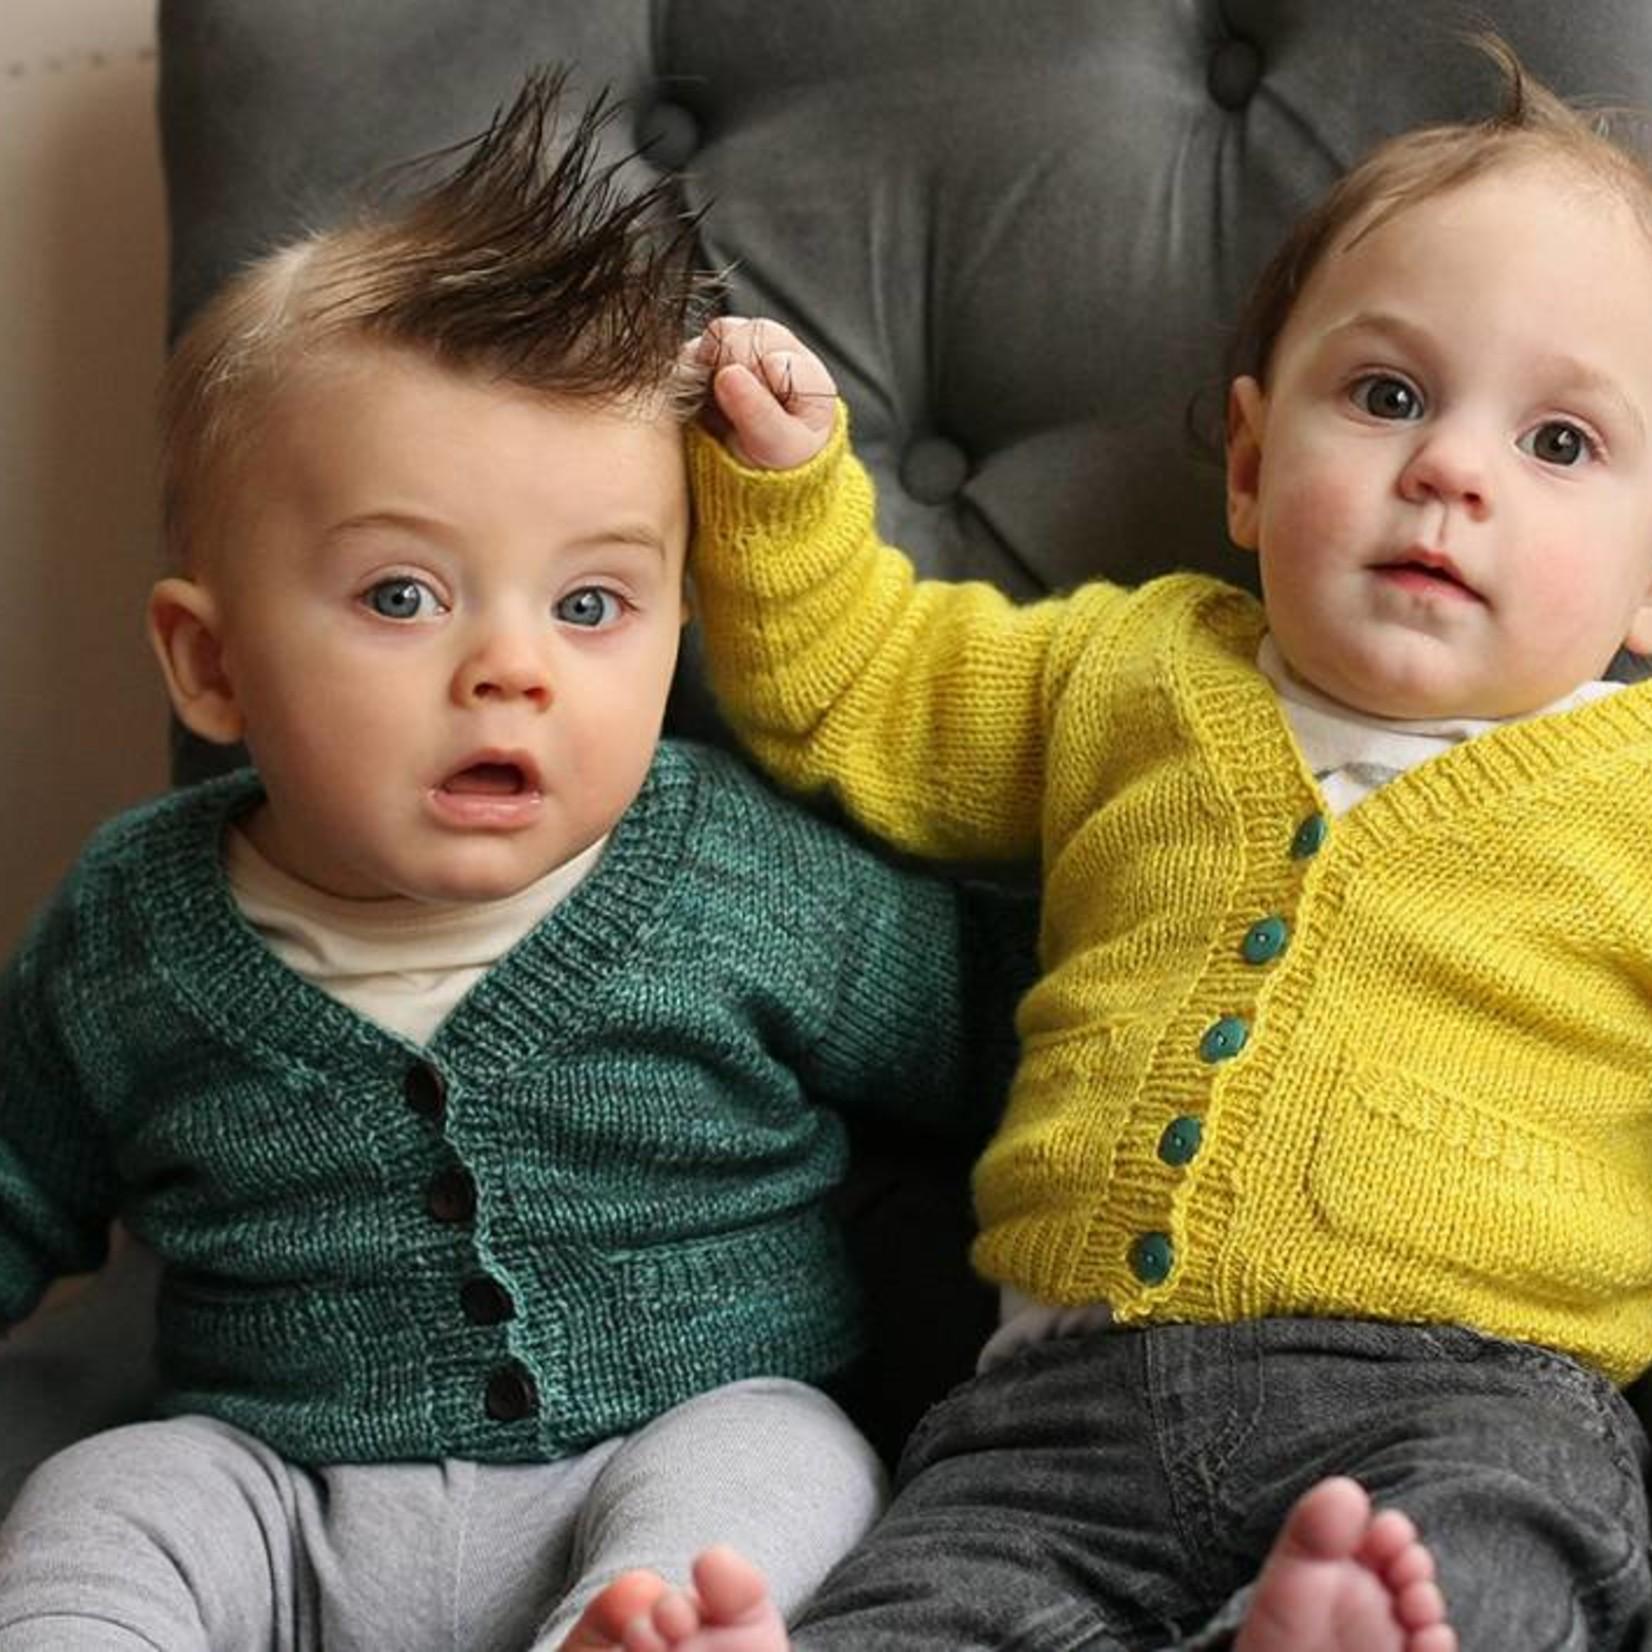 Tin Can Knits: Max & Bodhi's Wardrobe